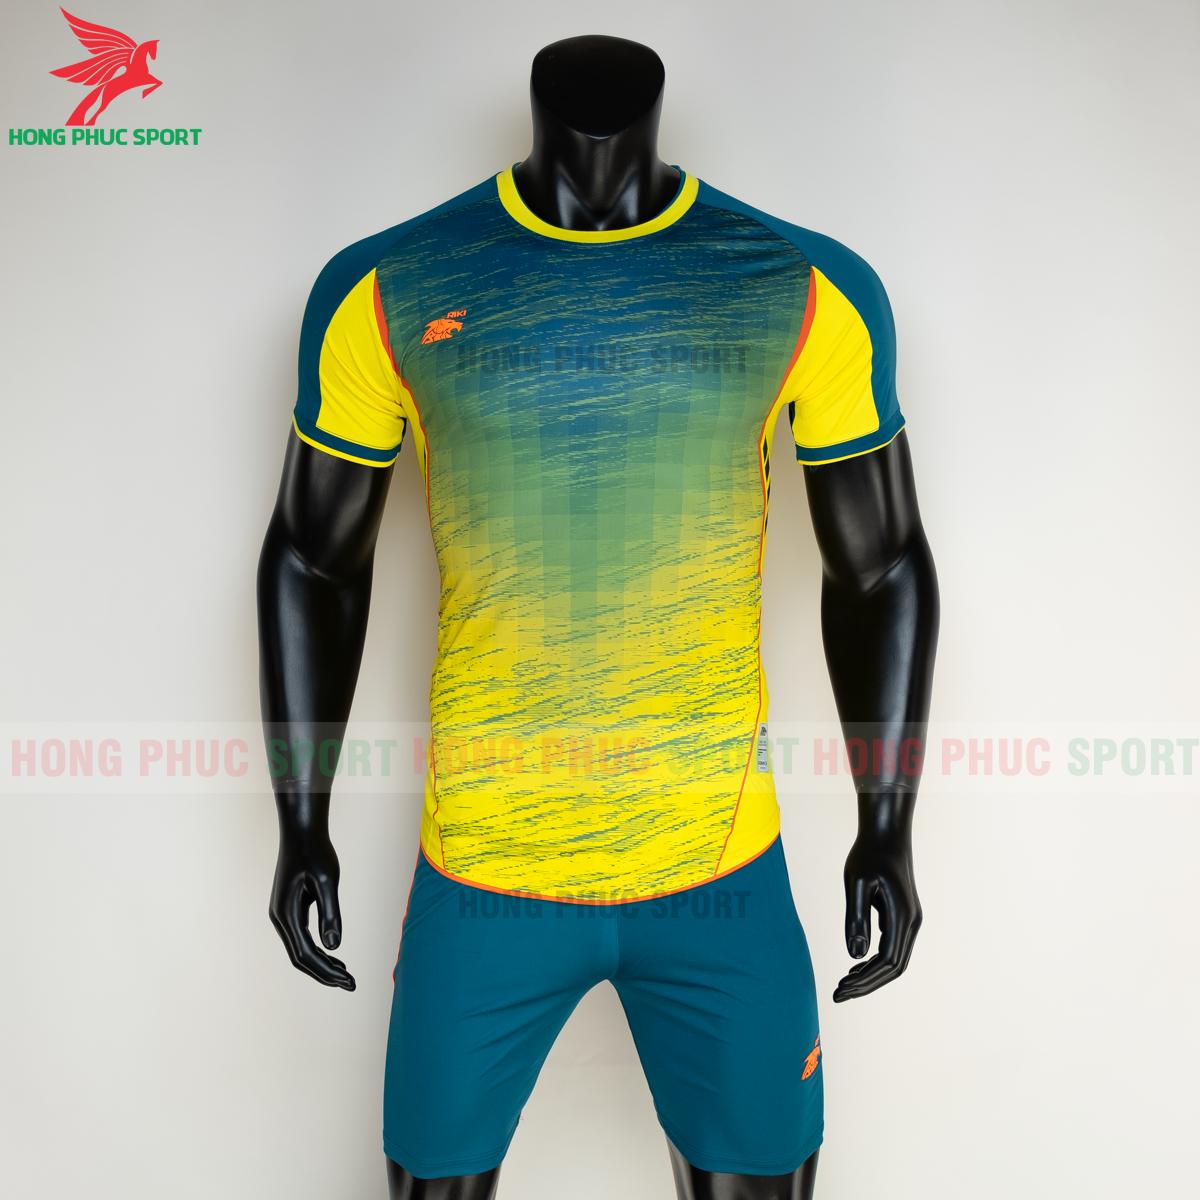 https://cdn.hongphucsport.com/unsafe/s4.shopbay.vn/files/285/ao-bong-da-khong-logo-riki-grambor-mau-vang-2-6050615d7dfef.png